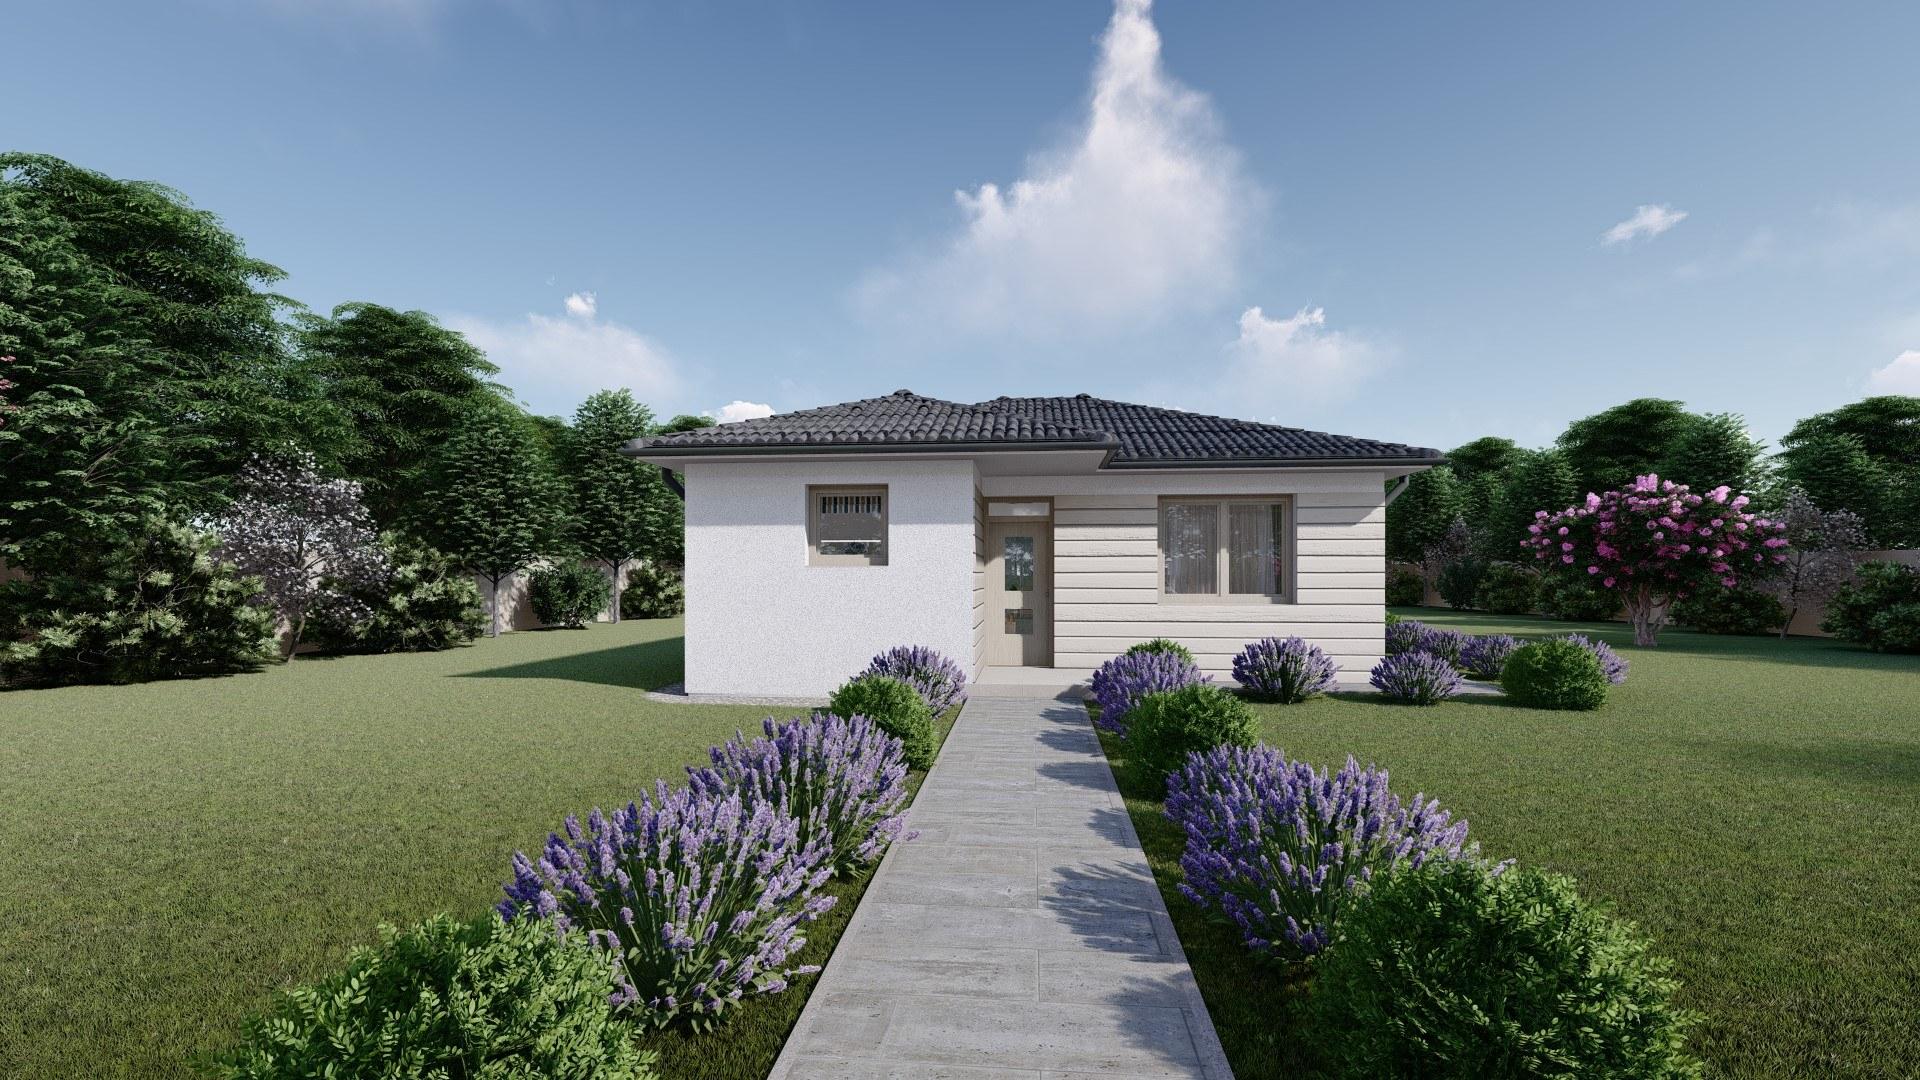 Projekt domu LEA 1 vizualizácia vchodu